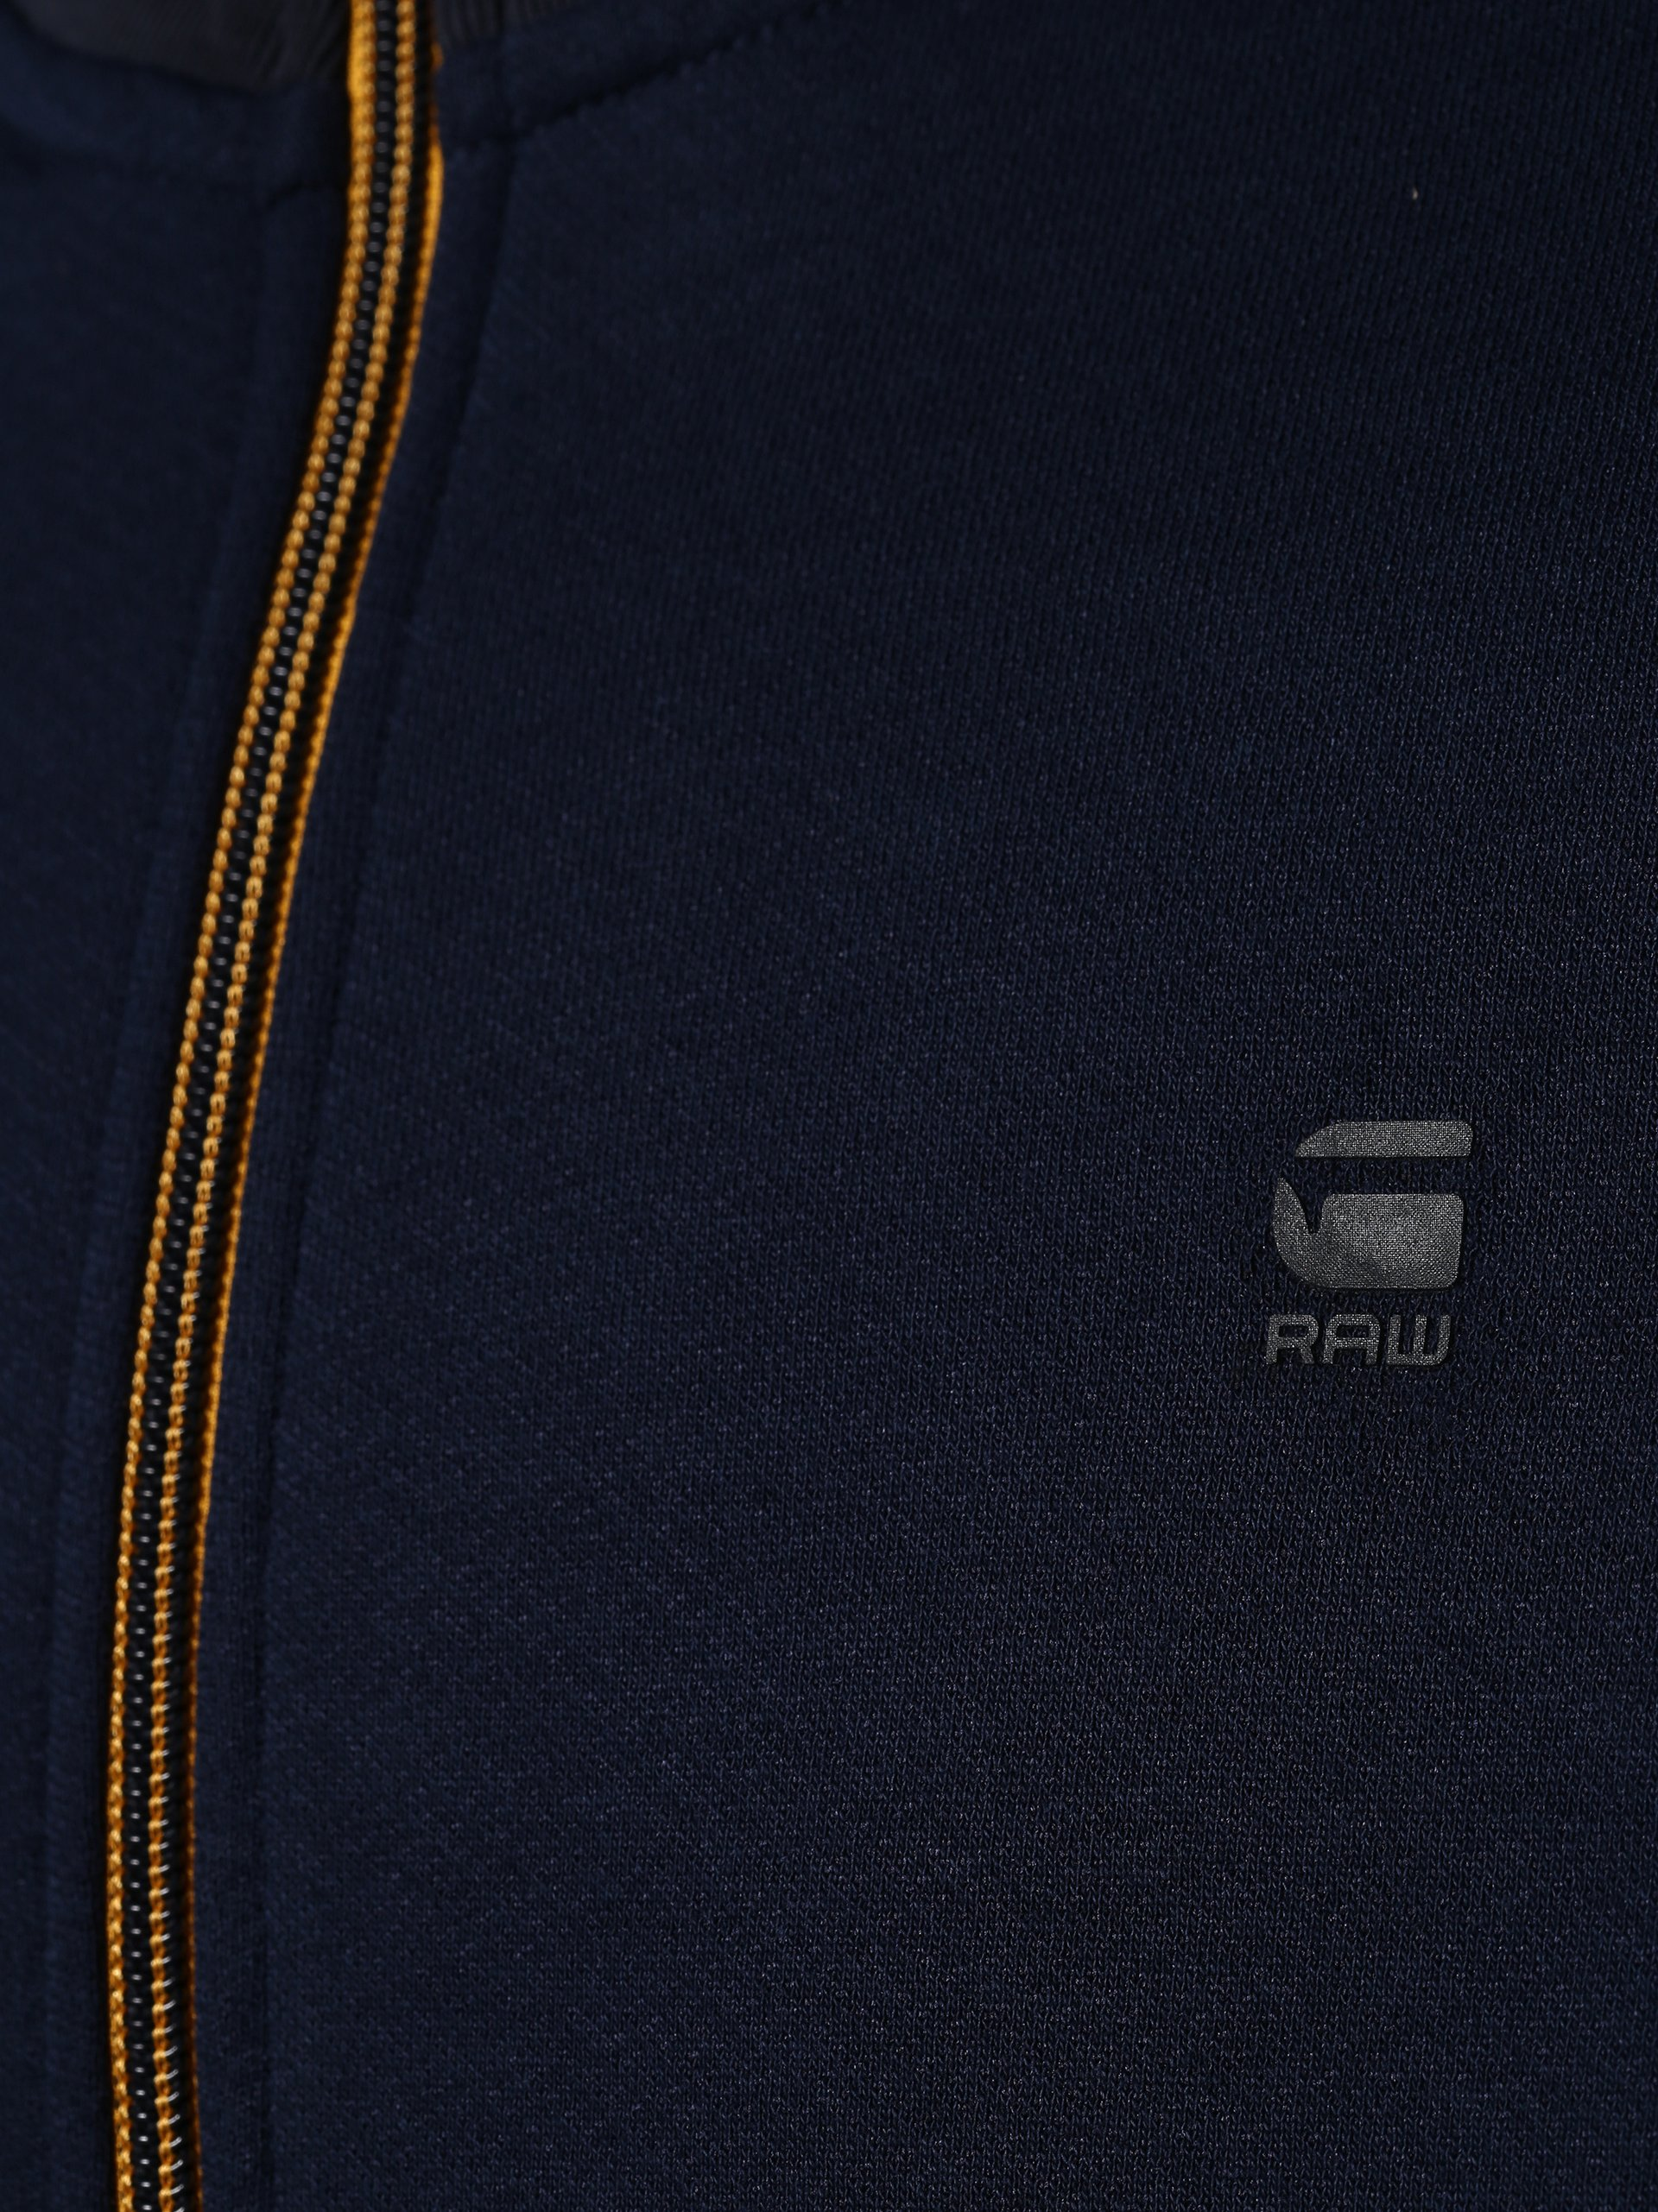 G-Star RAW Męska bluza rozpinana